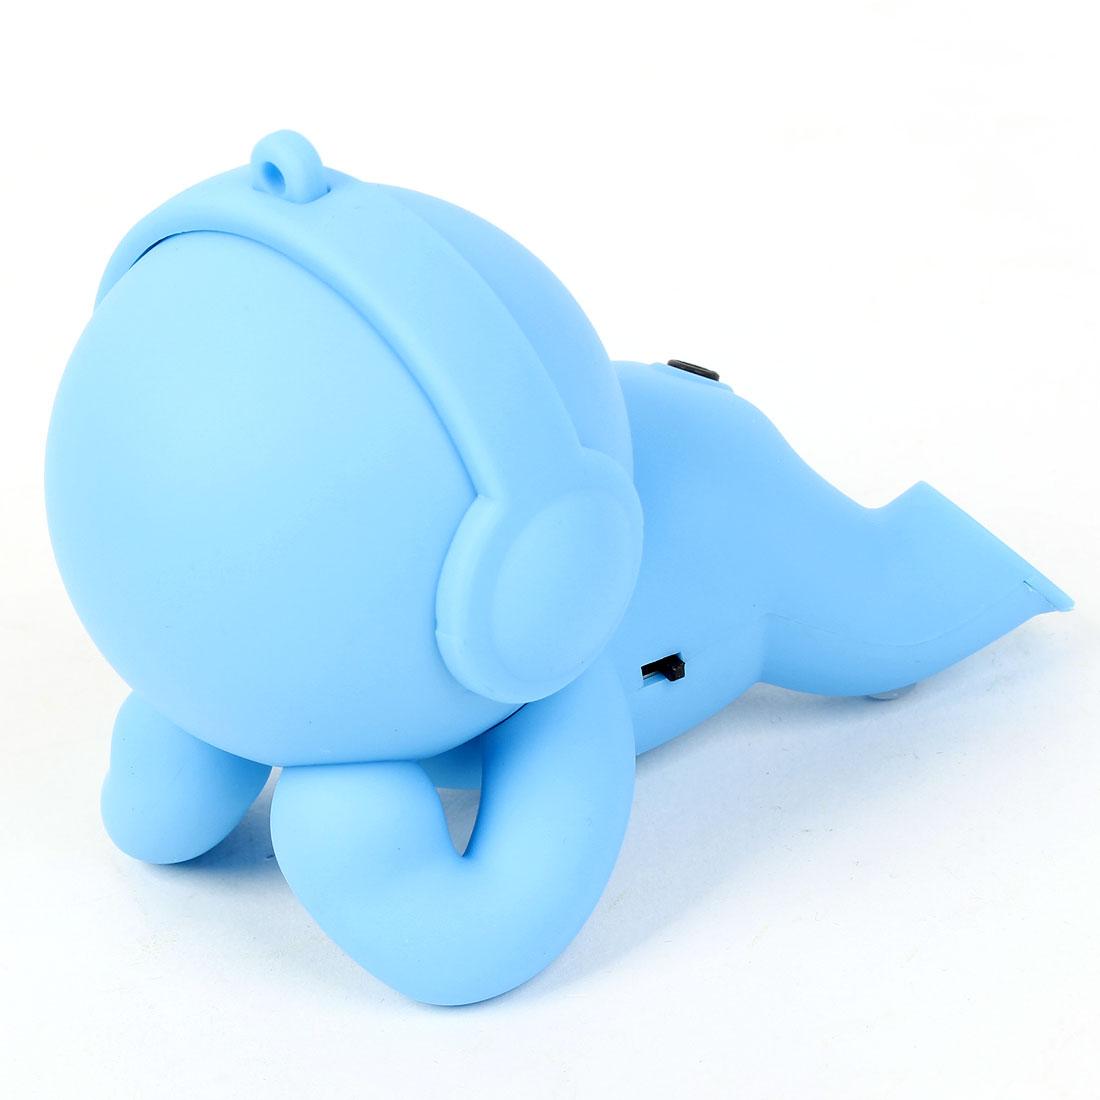 PC Computer Cartoon Baby Shaped MP3 Laptop Mini USB 3.5mm Jack Speaker Blue